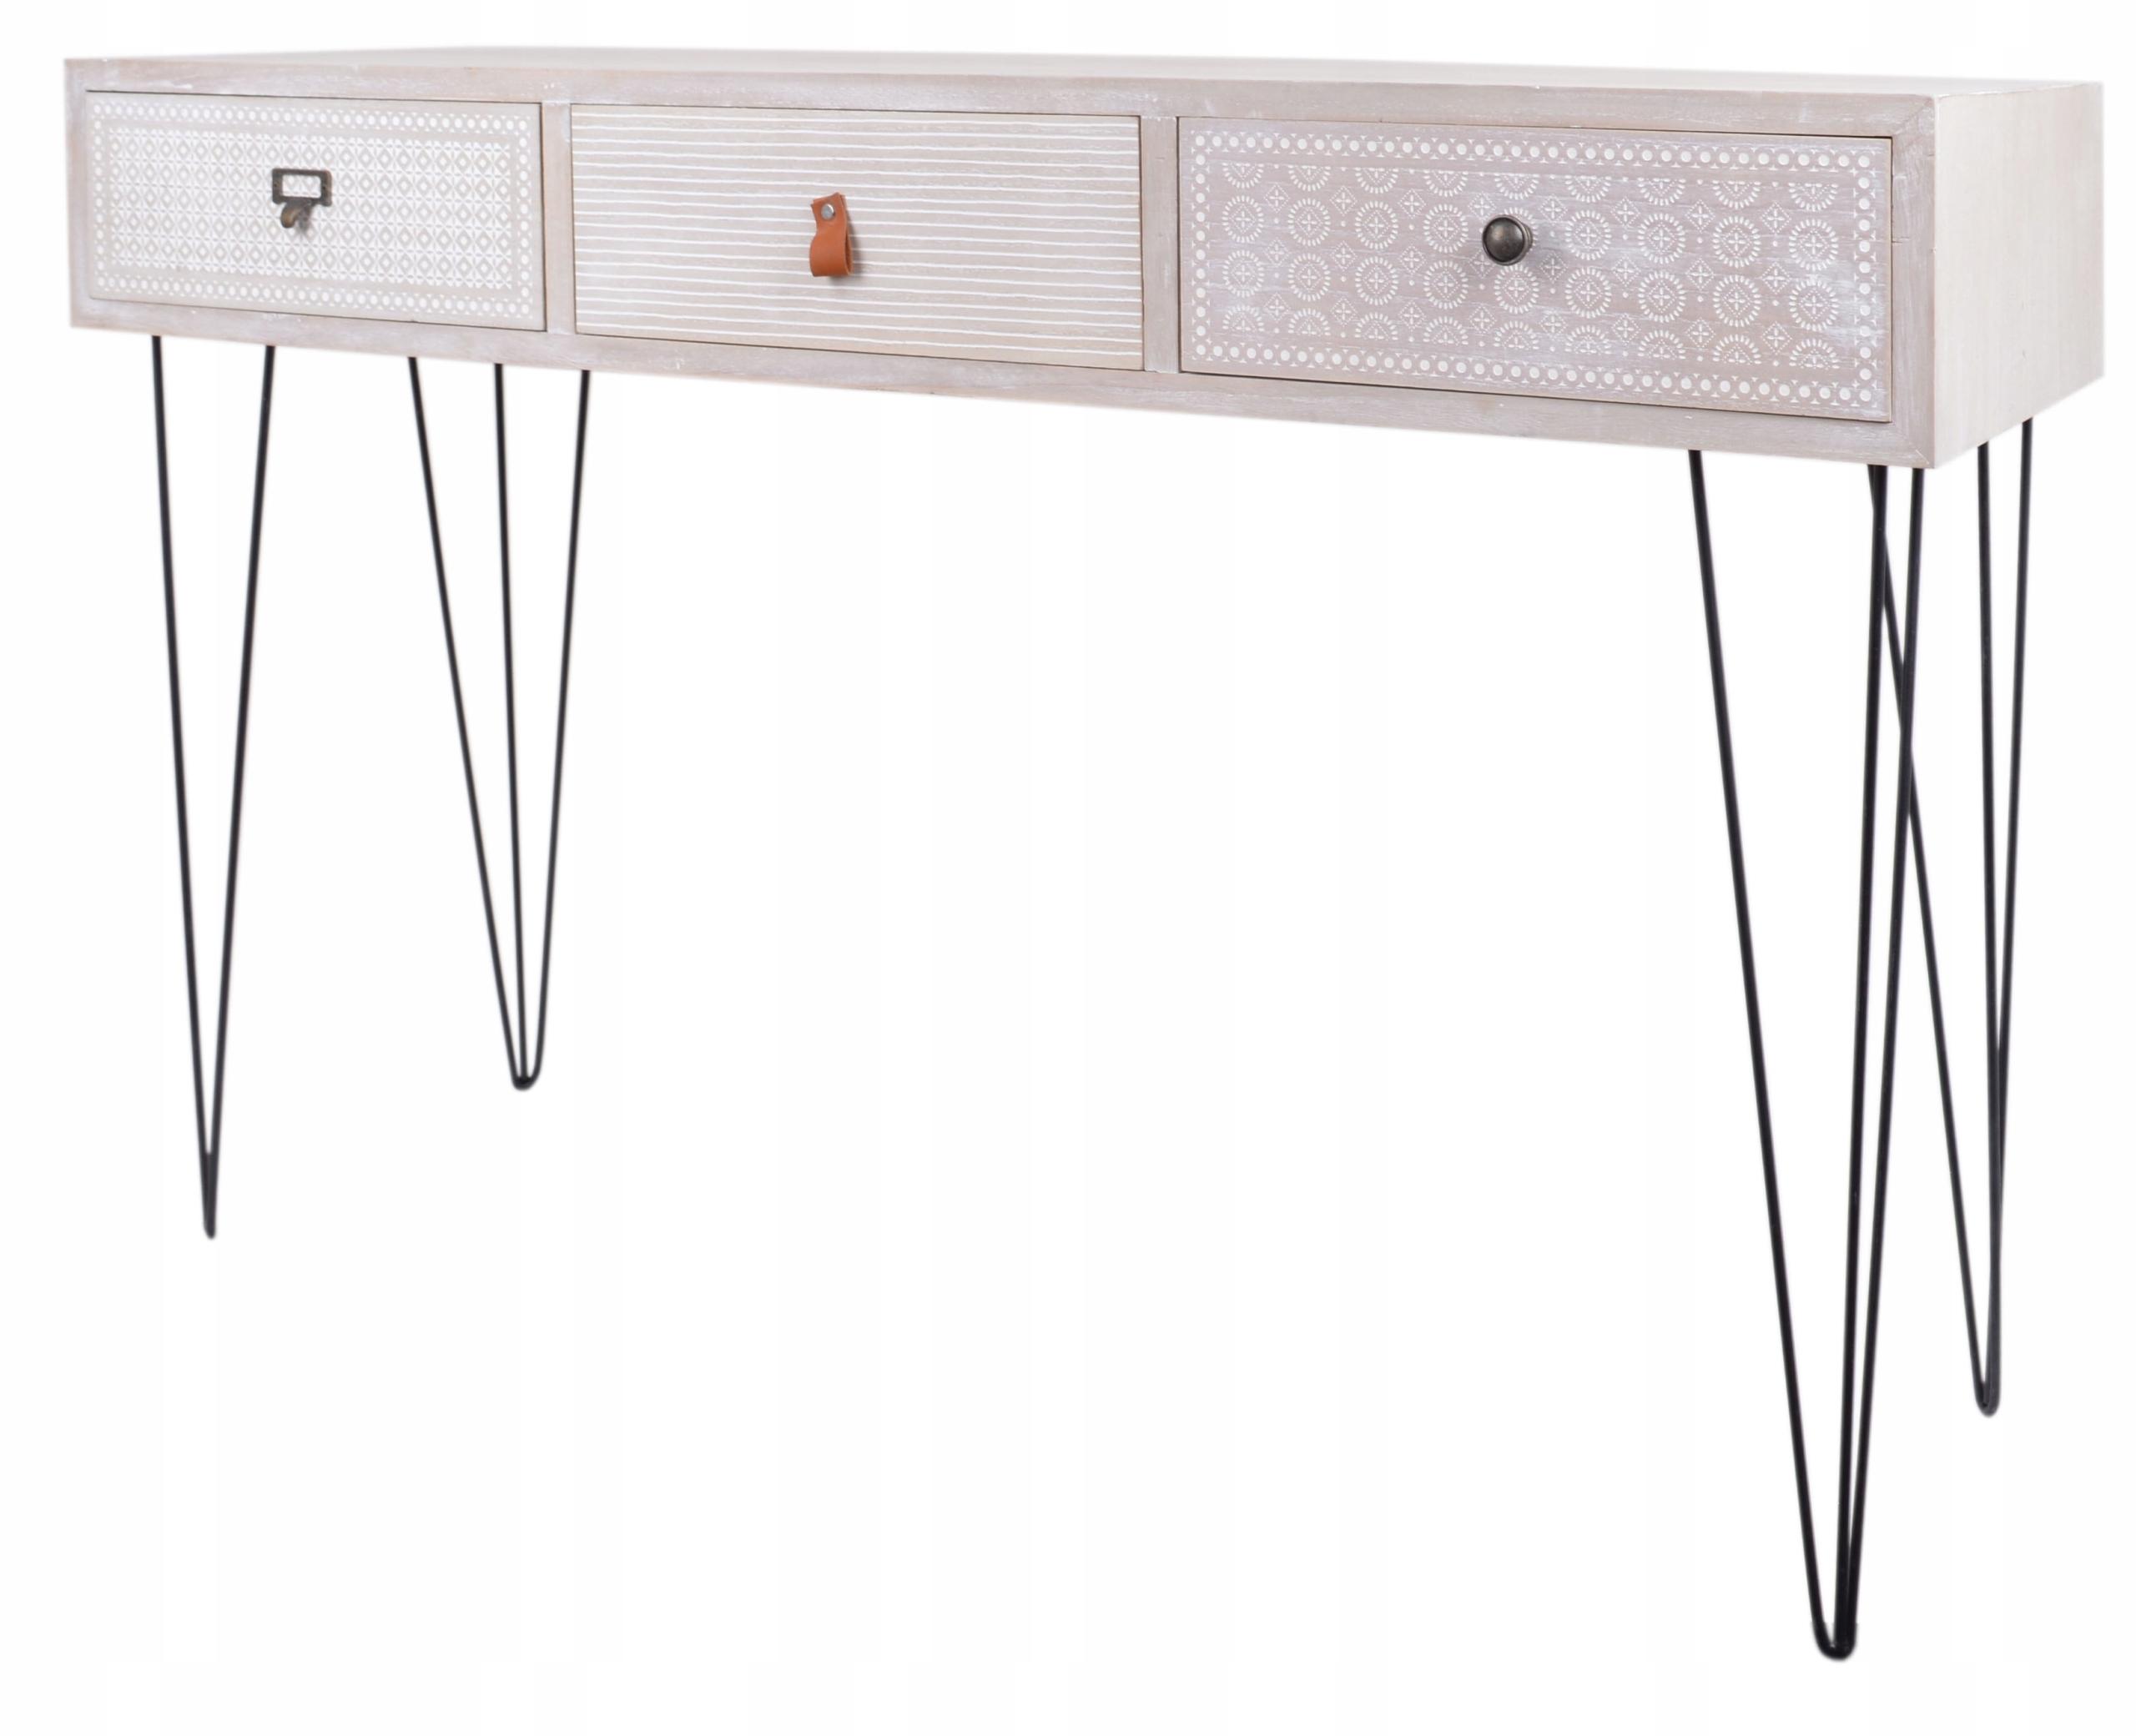 Console tabuľka sivá retro ozdoby, drevené pro